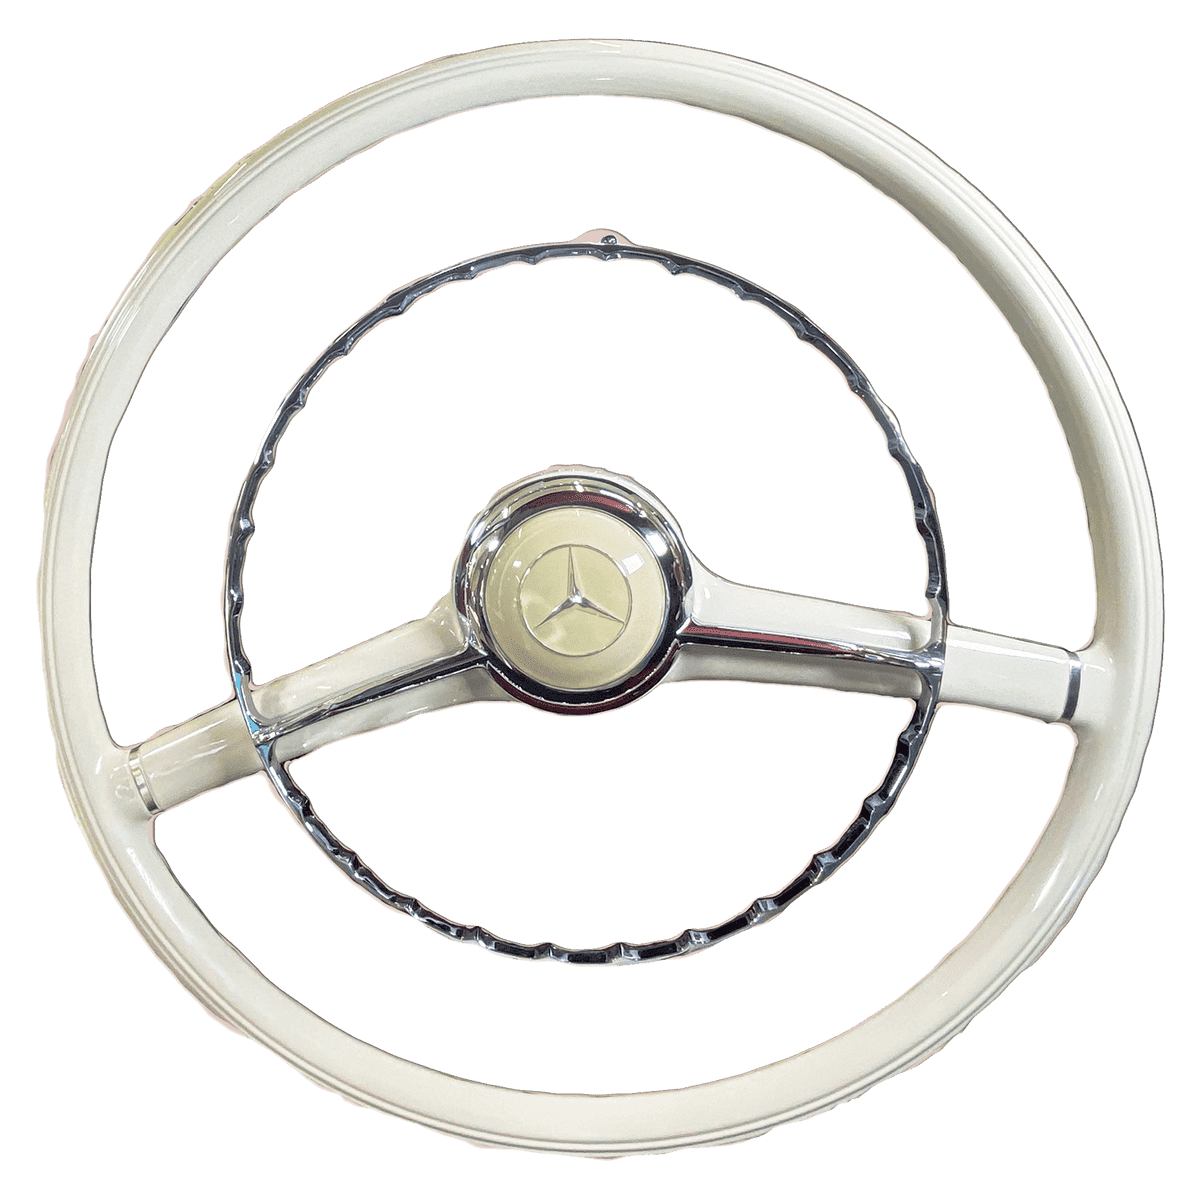 Oldtimer Classic 190SL Lenkrad